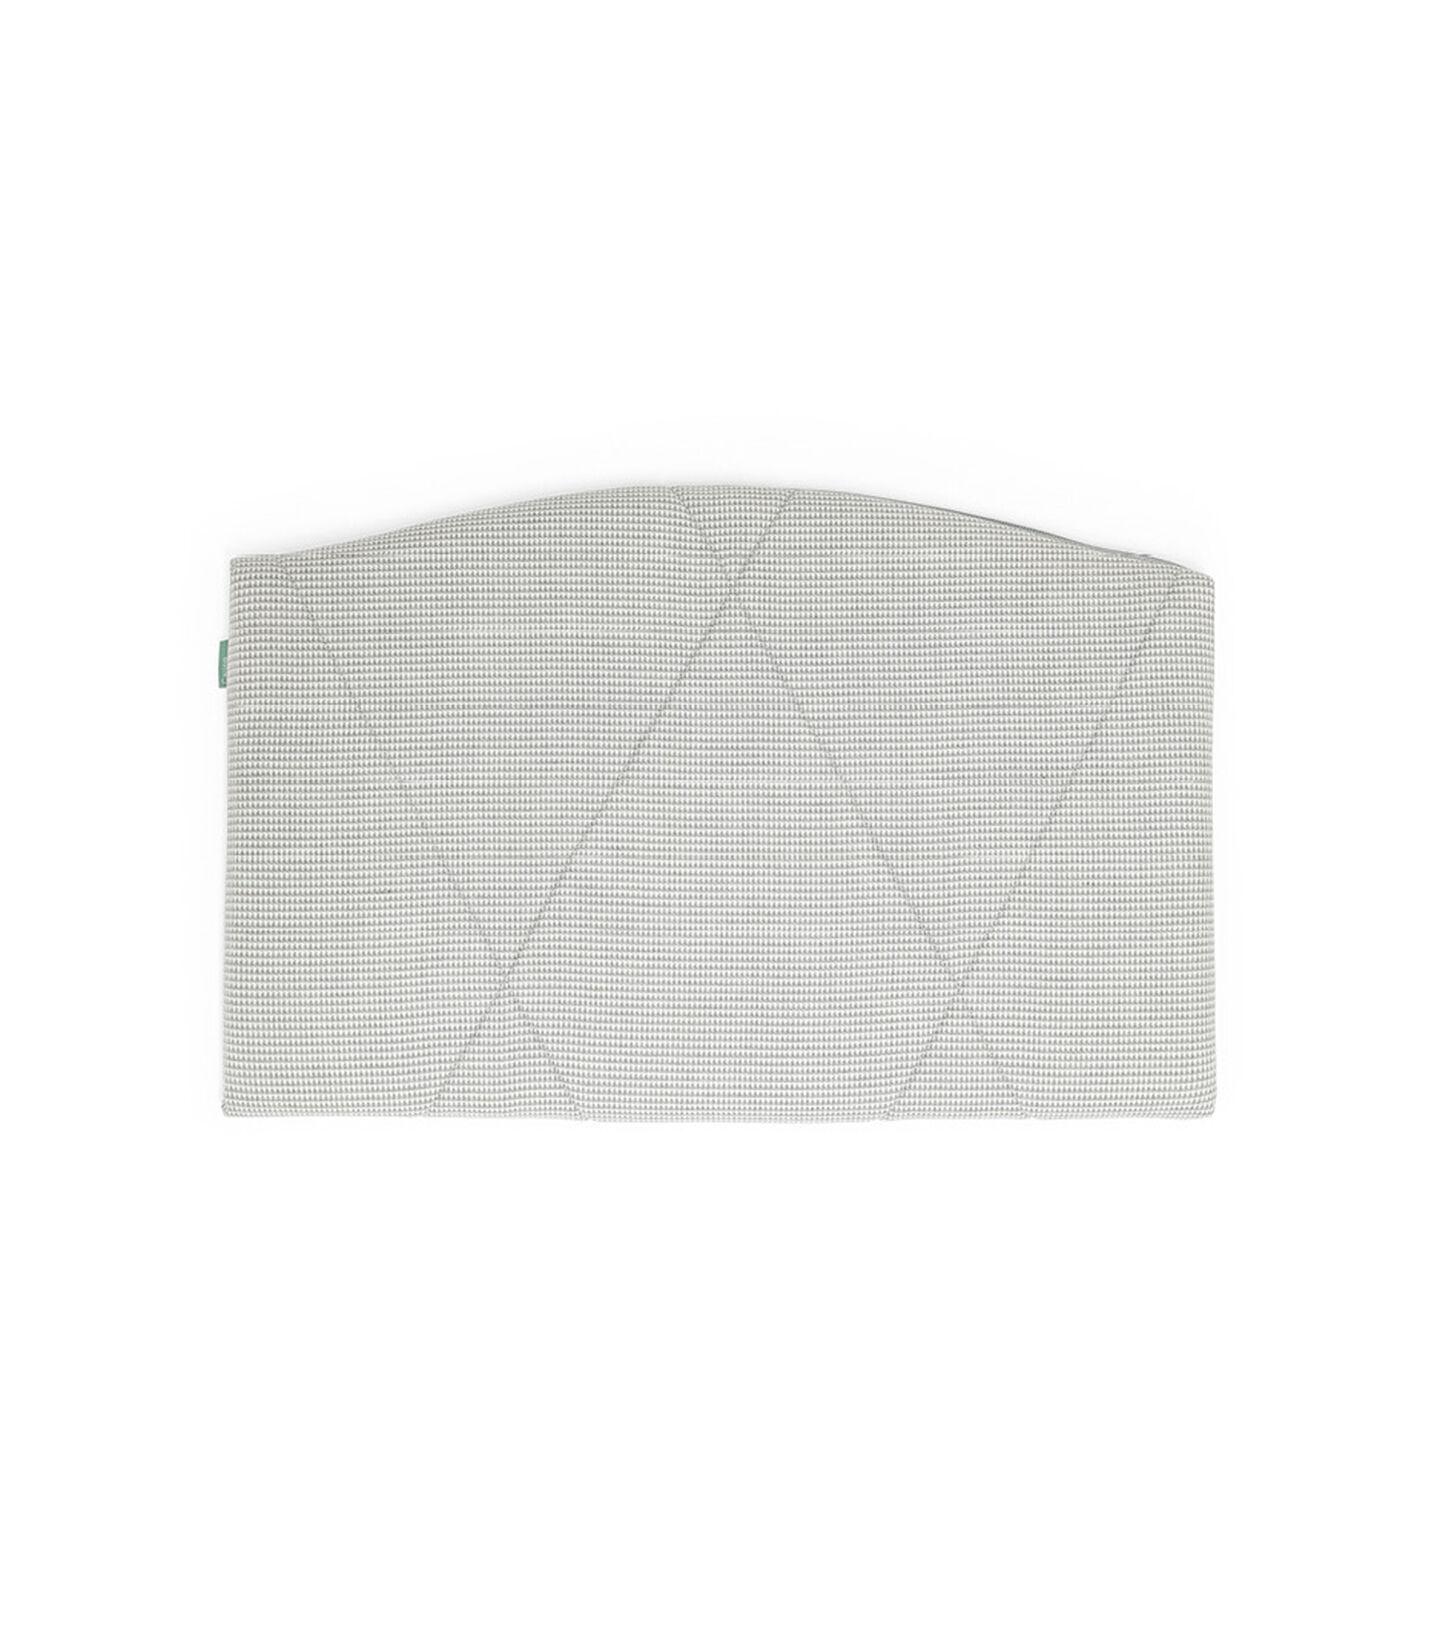 Tripp Trapp® Junior Cushion Nordic Grey, Nordic Grey, mainview view 2